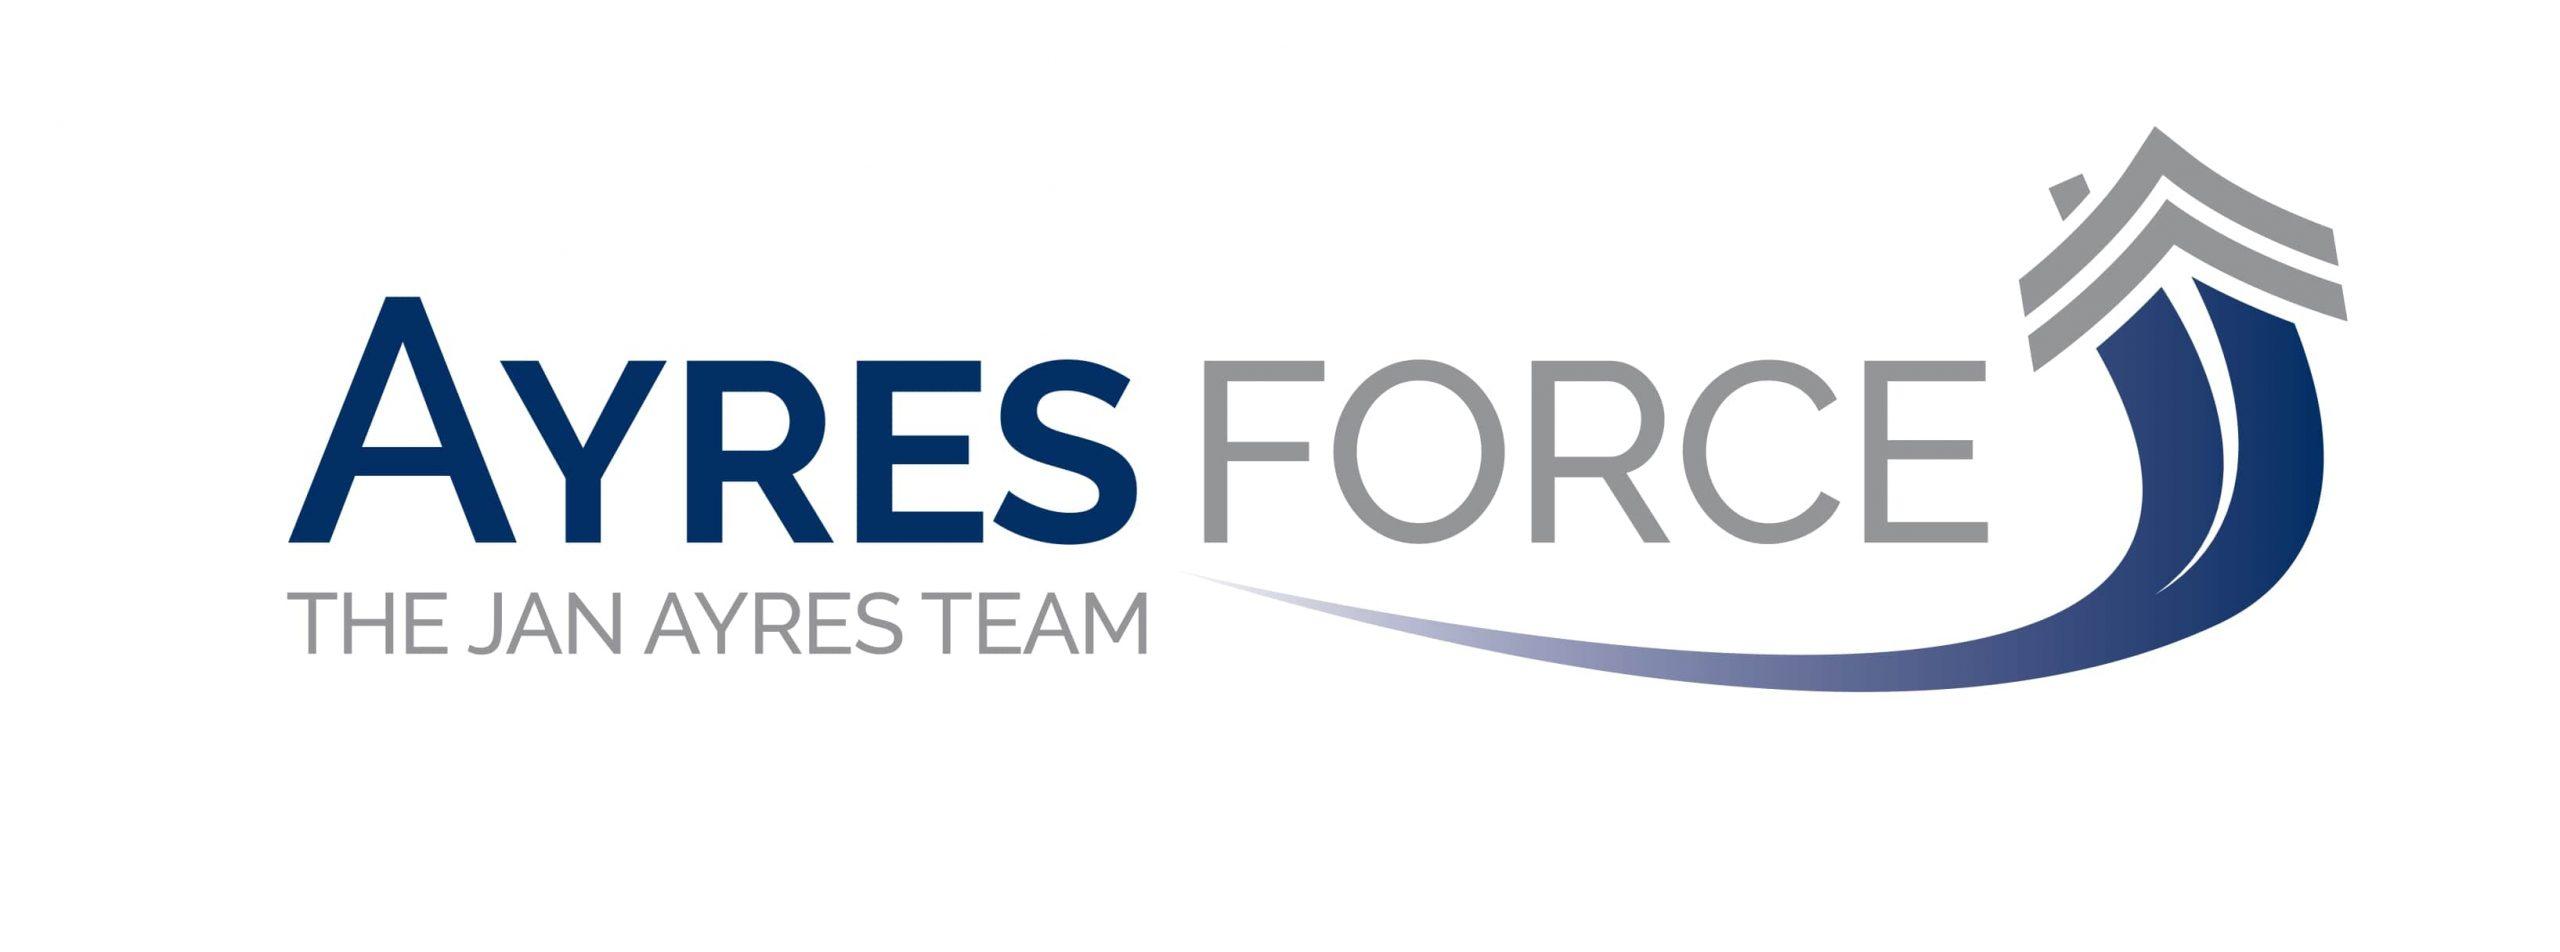 Ayres Force Logo